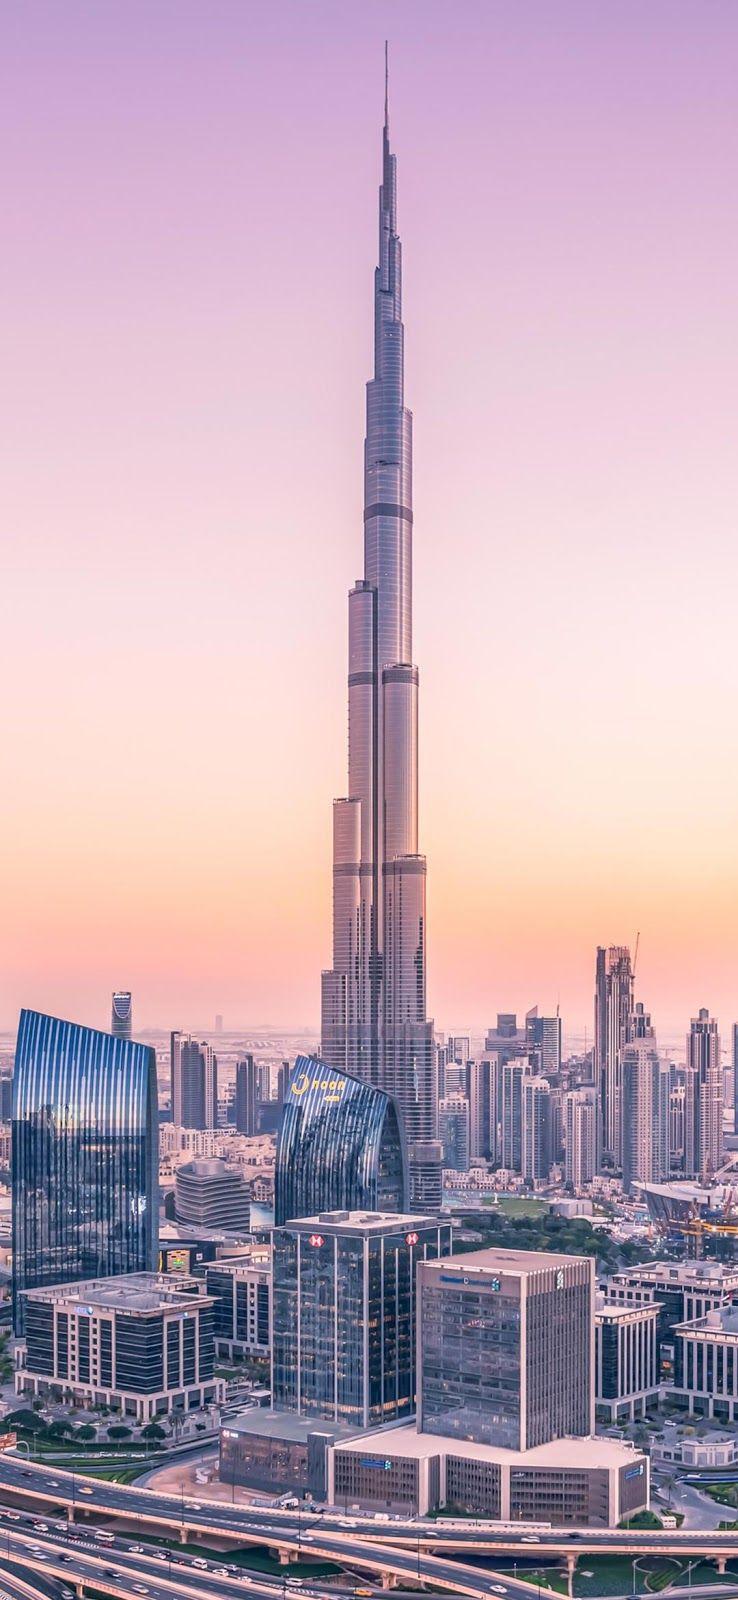 Burj Khalifa Wallpaper Cityscape Wallpaper Cityscape Dubai Wallpaper Hd